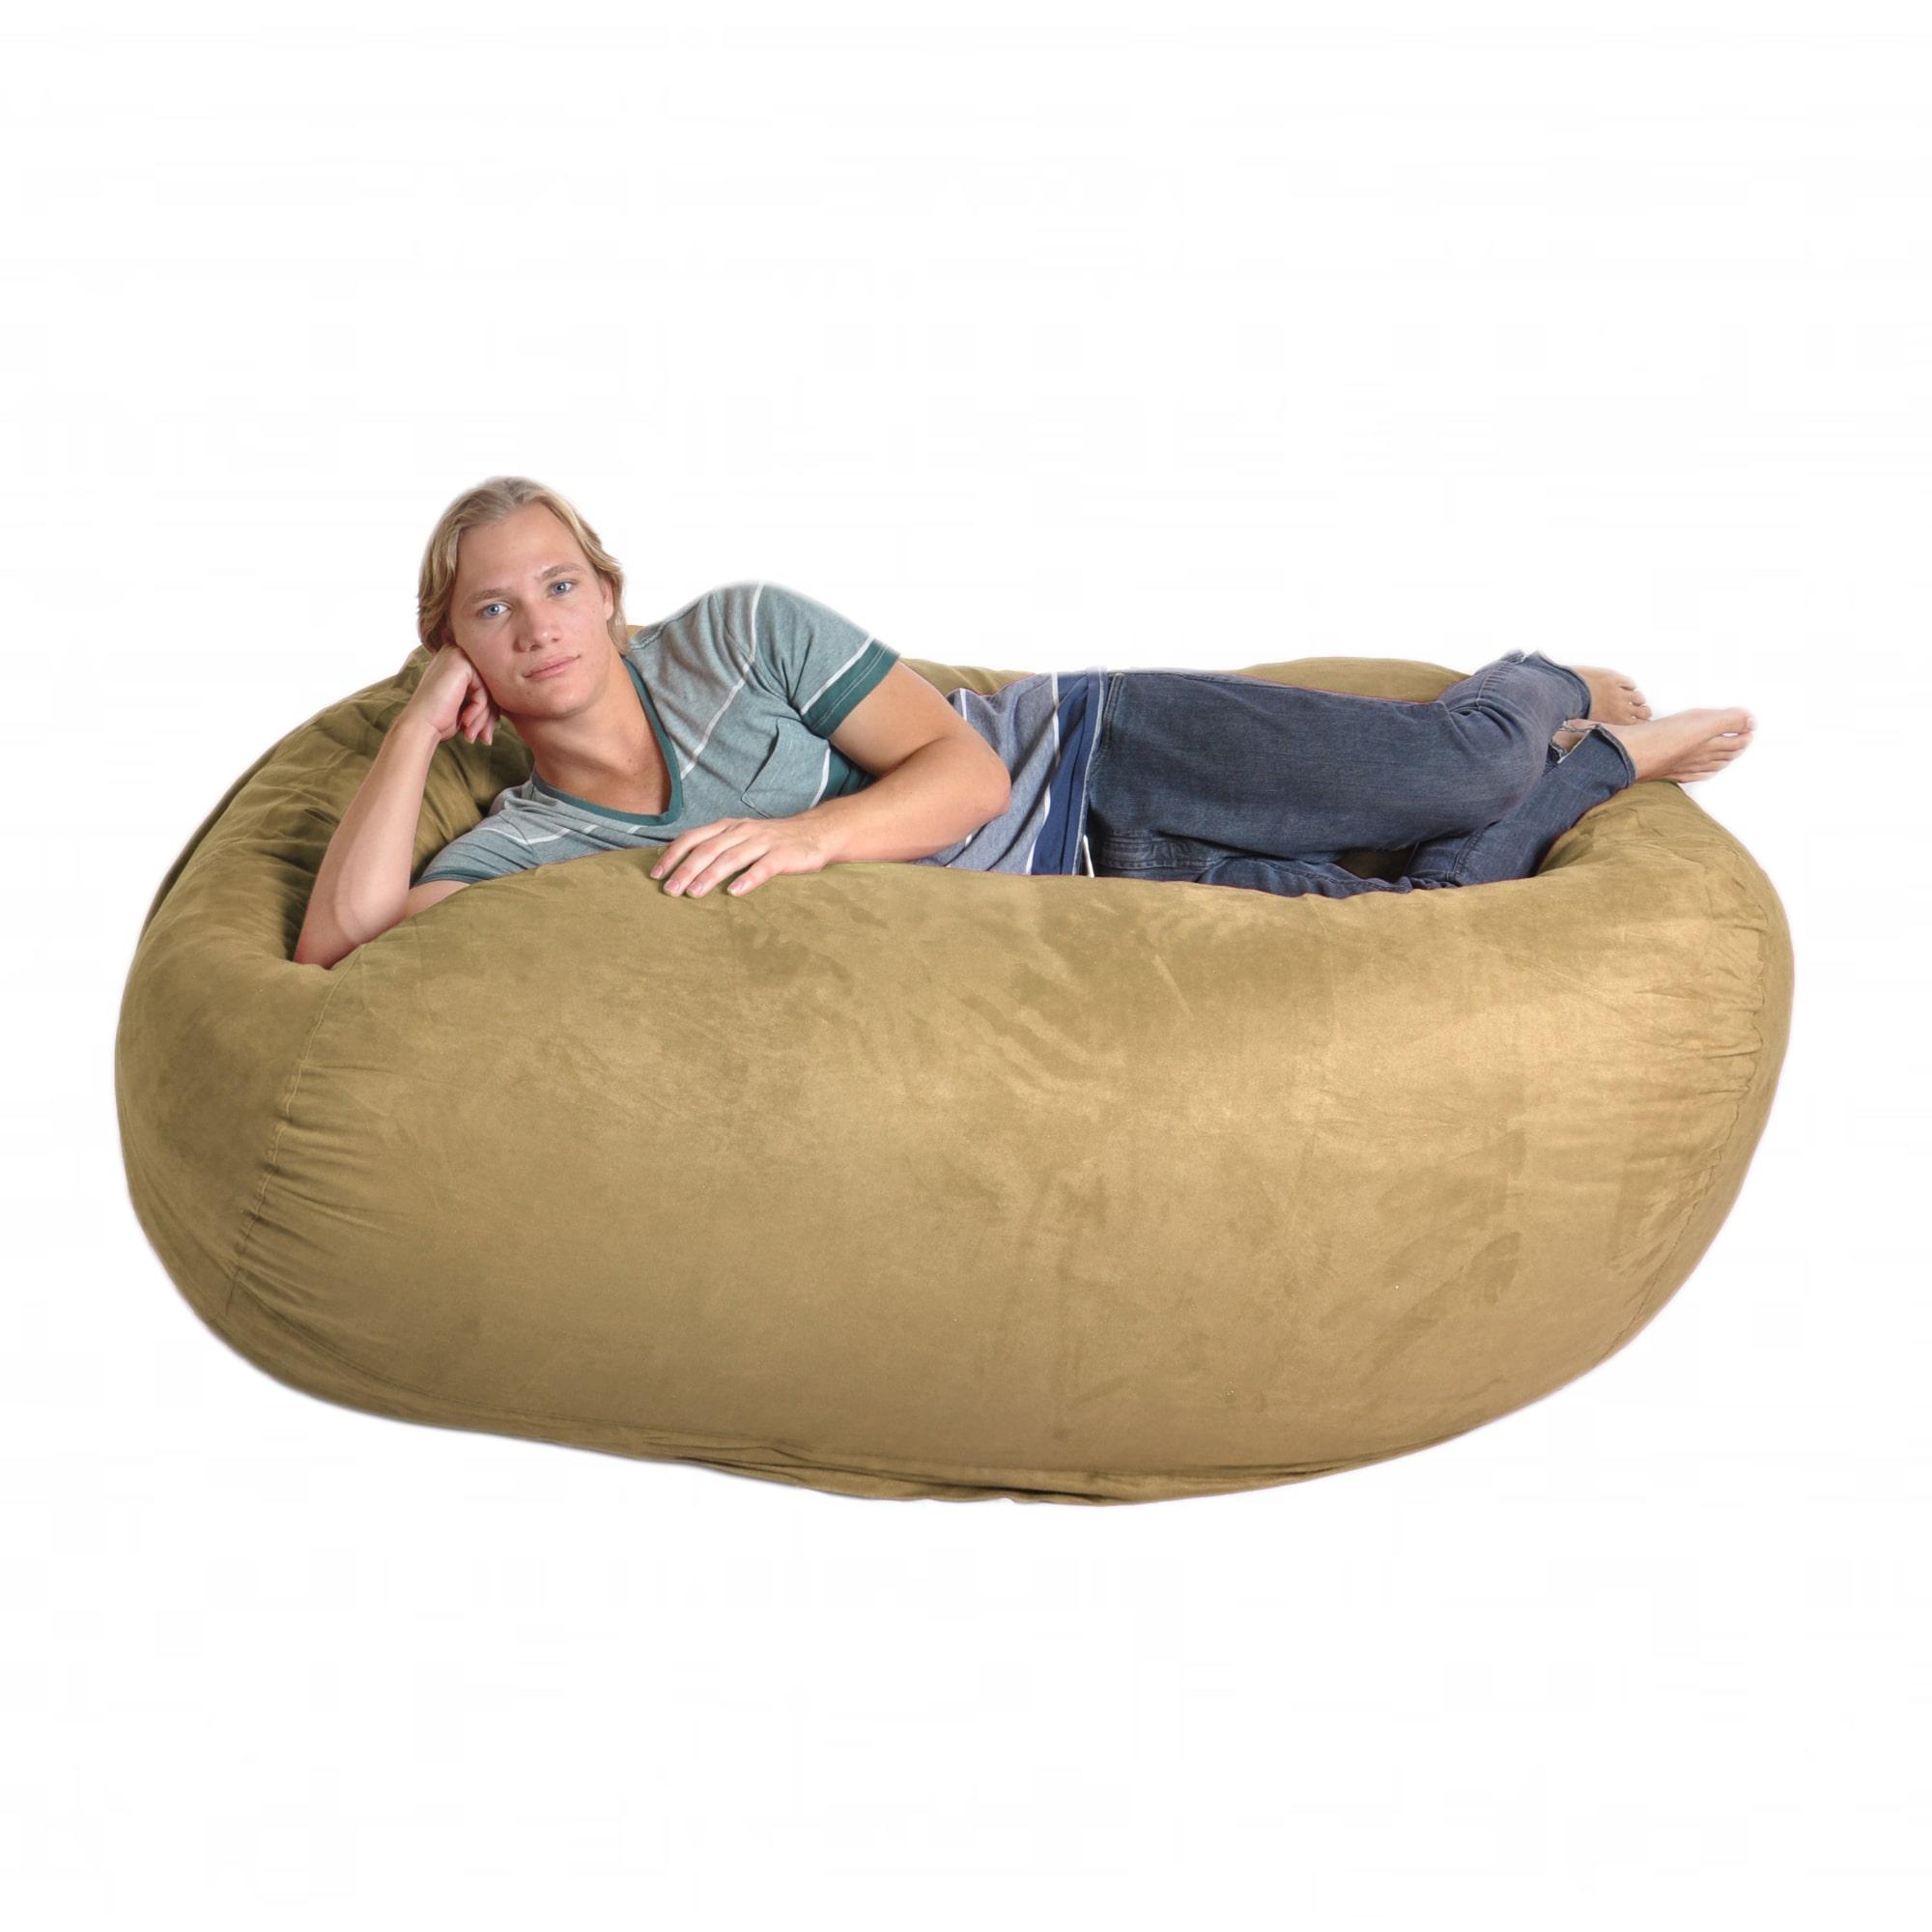 Slacker Sack Oval 6-foot Light Brown Microfiber and Memory Foam Bean Bag